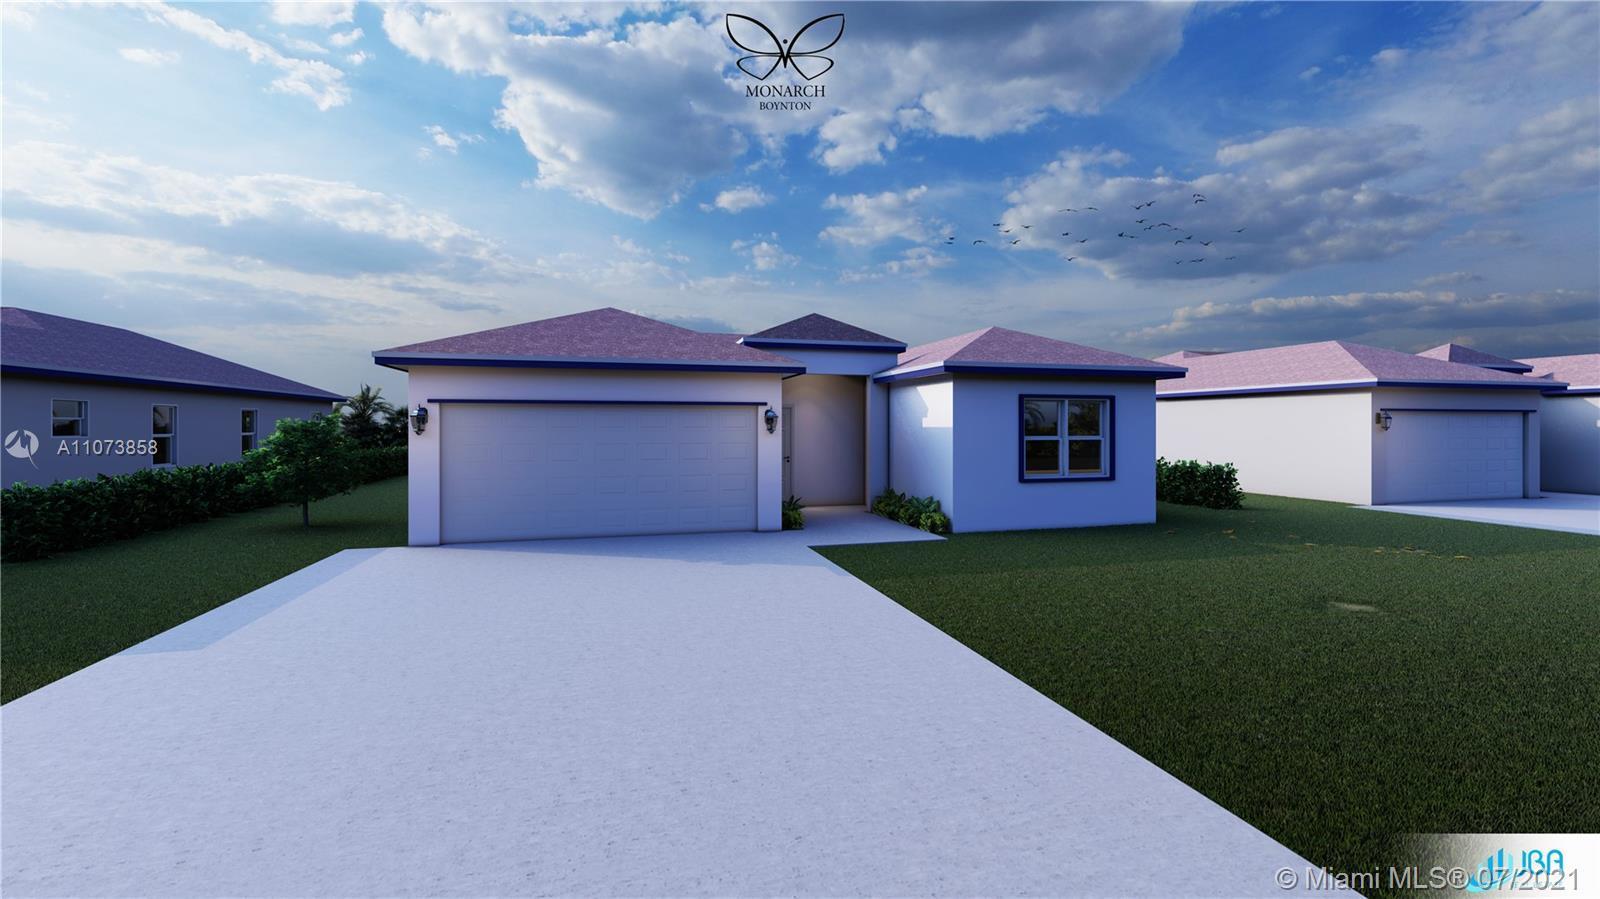 The NEWEST construction to hit Palm Beach County. The Monarch Boynton Beach is a 10 single-family ho